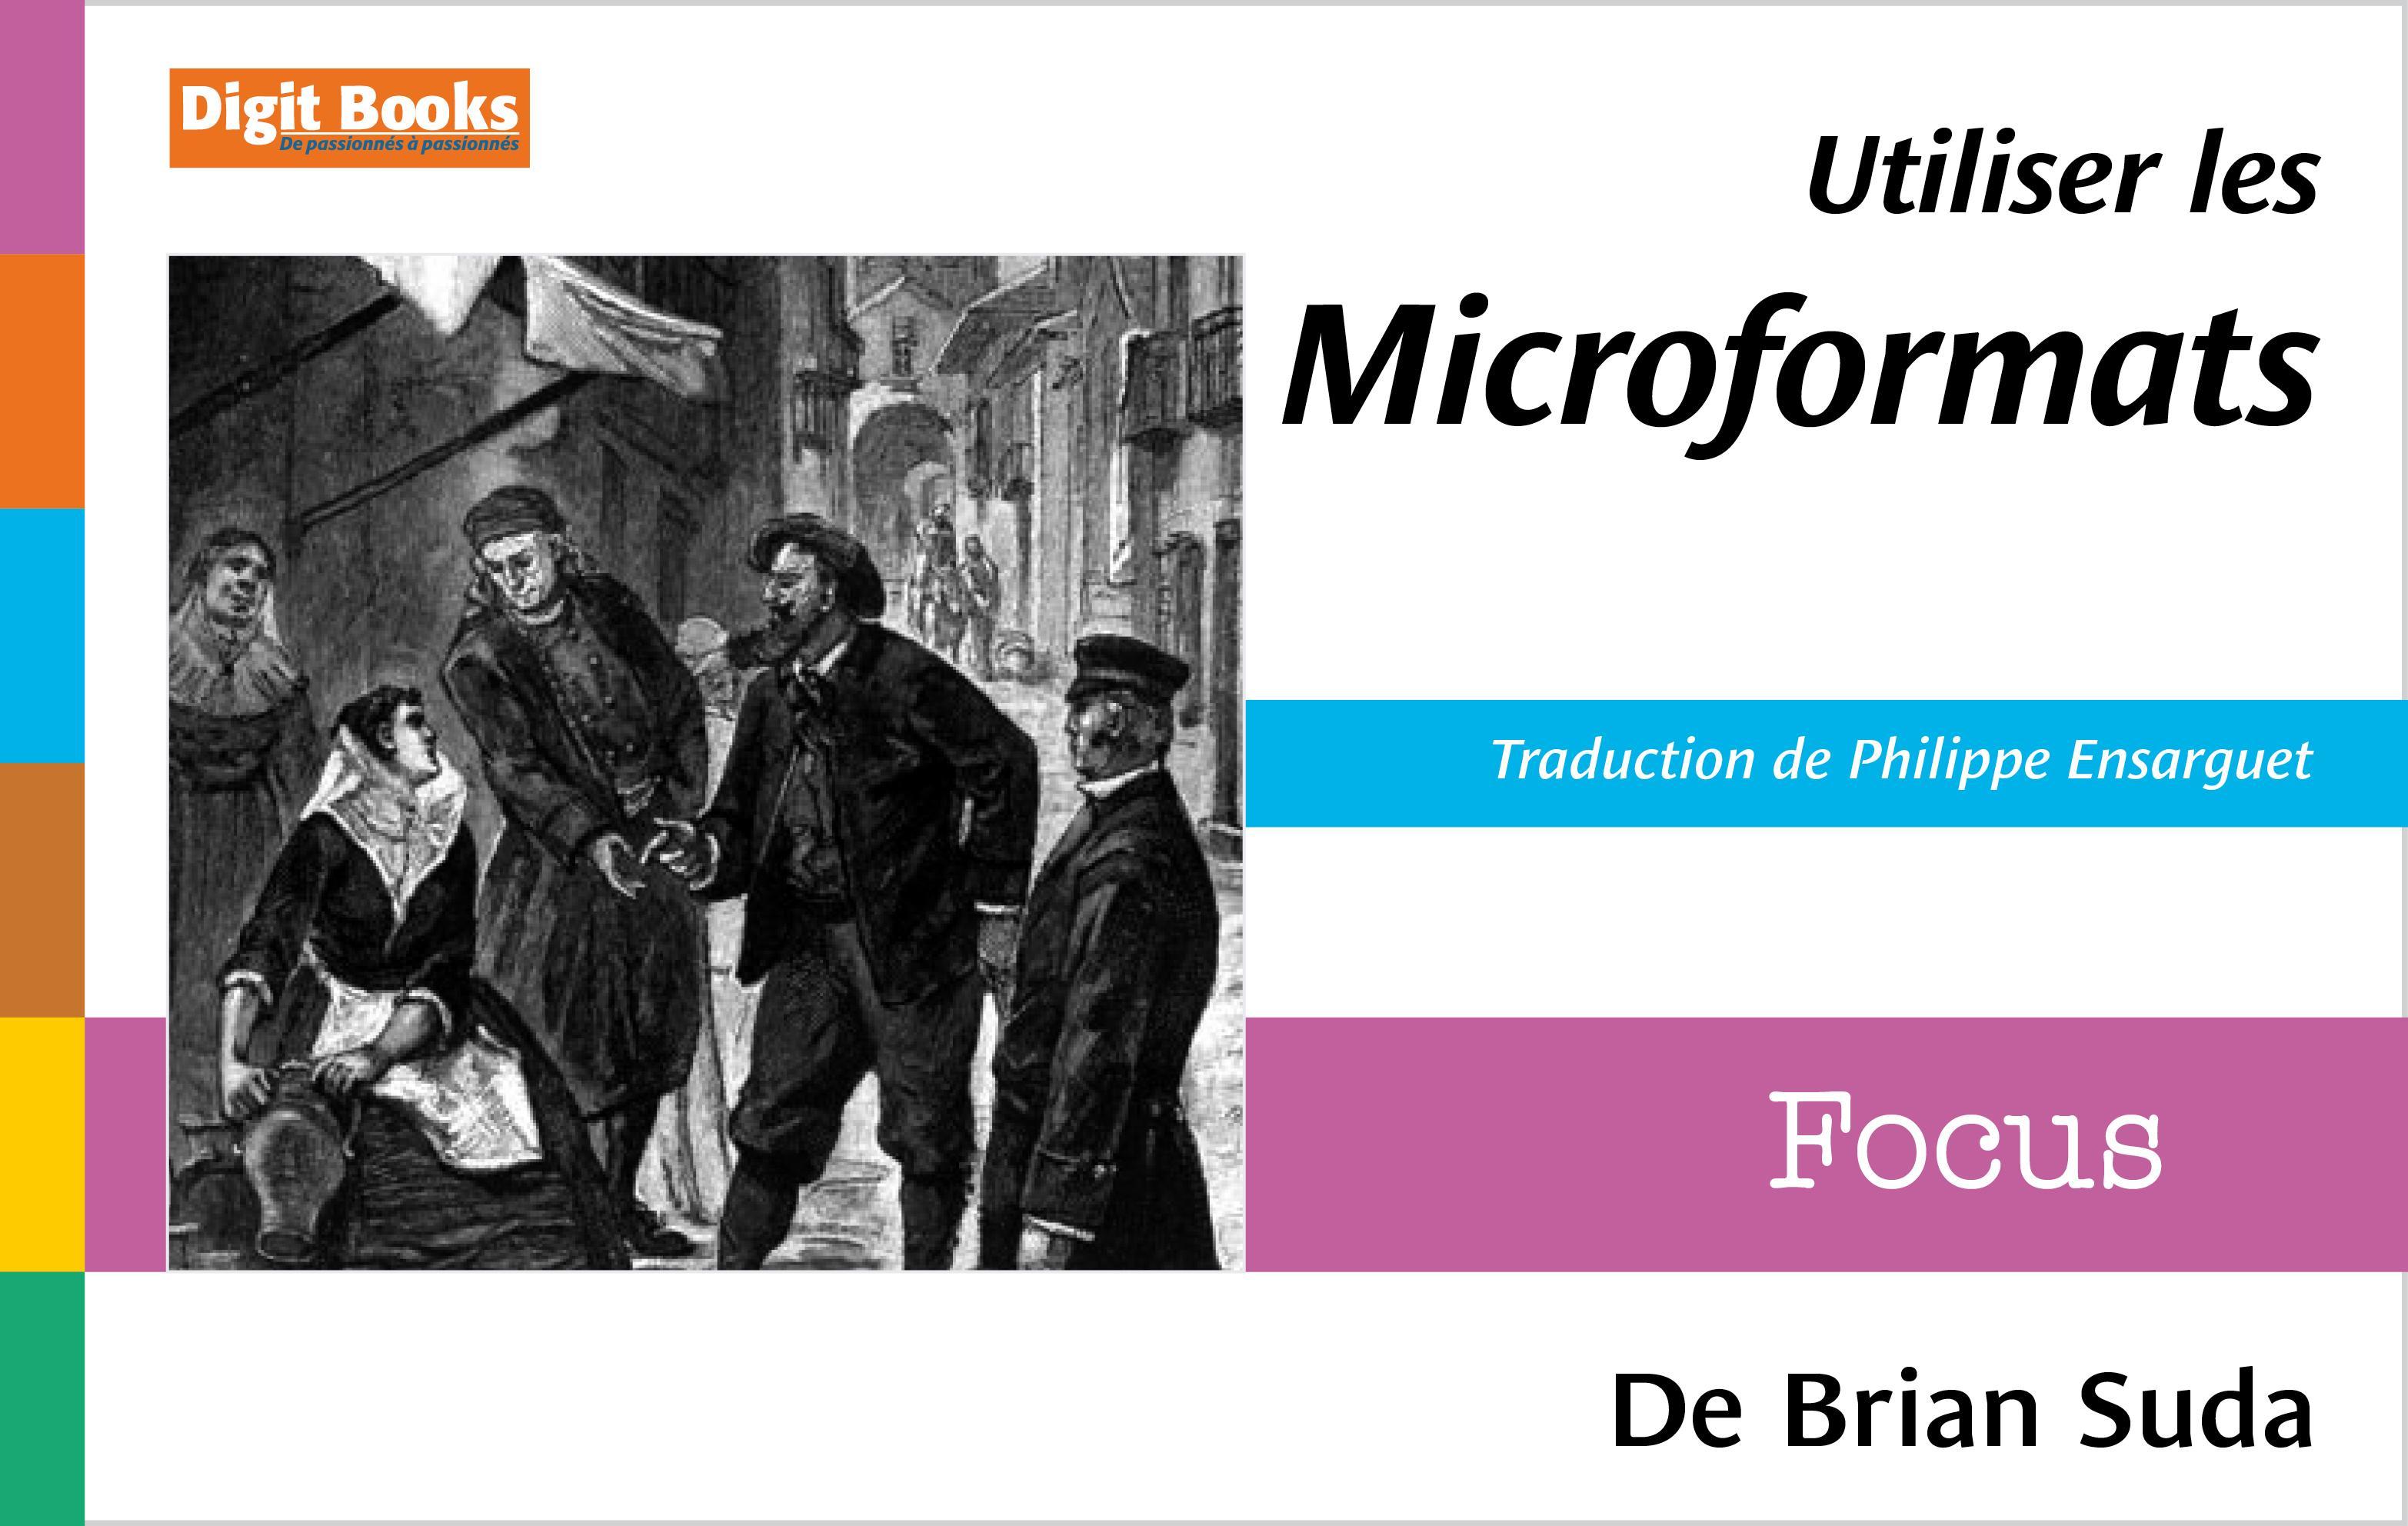 Utiliser les Microformats